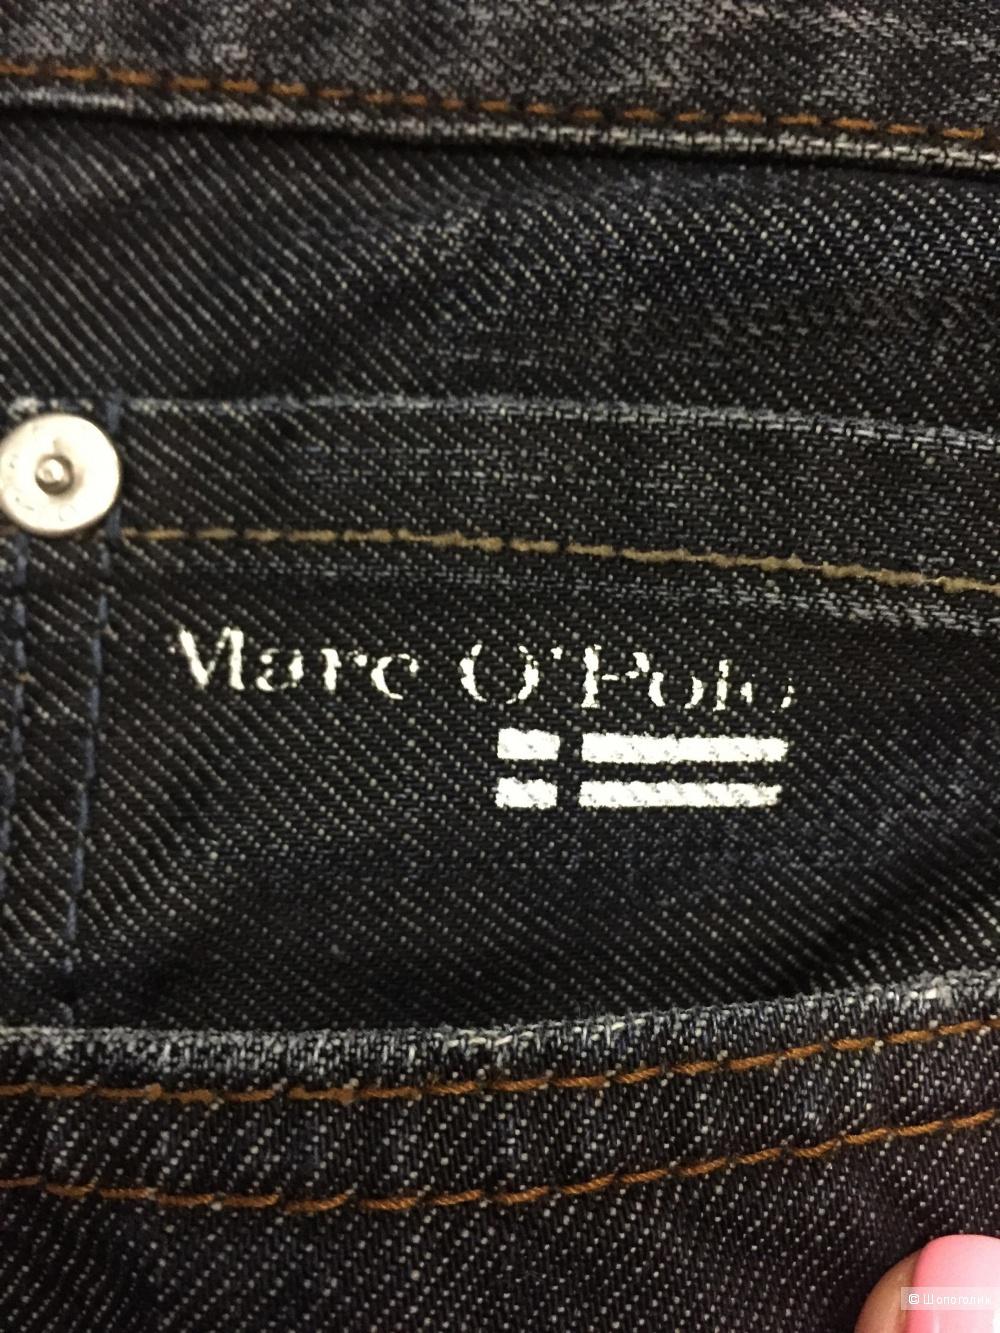 Мужские джинсы Marc O'Polo , размер XL